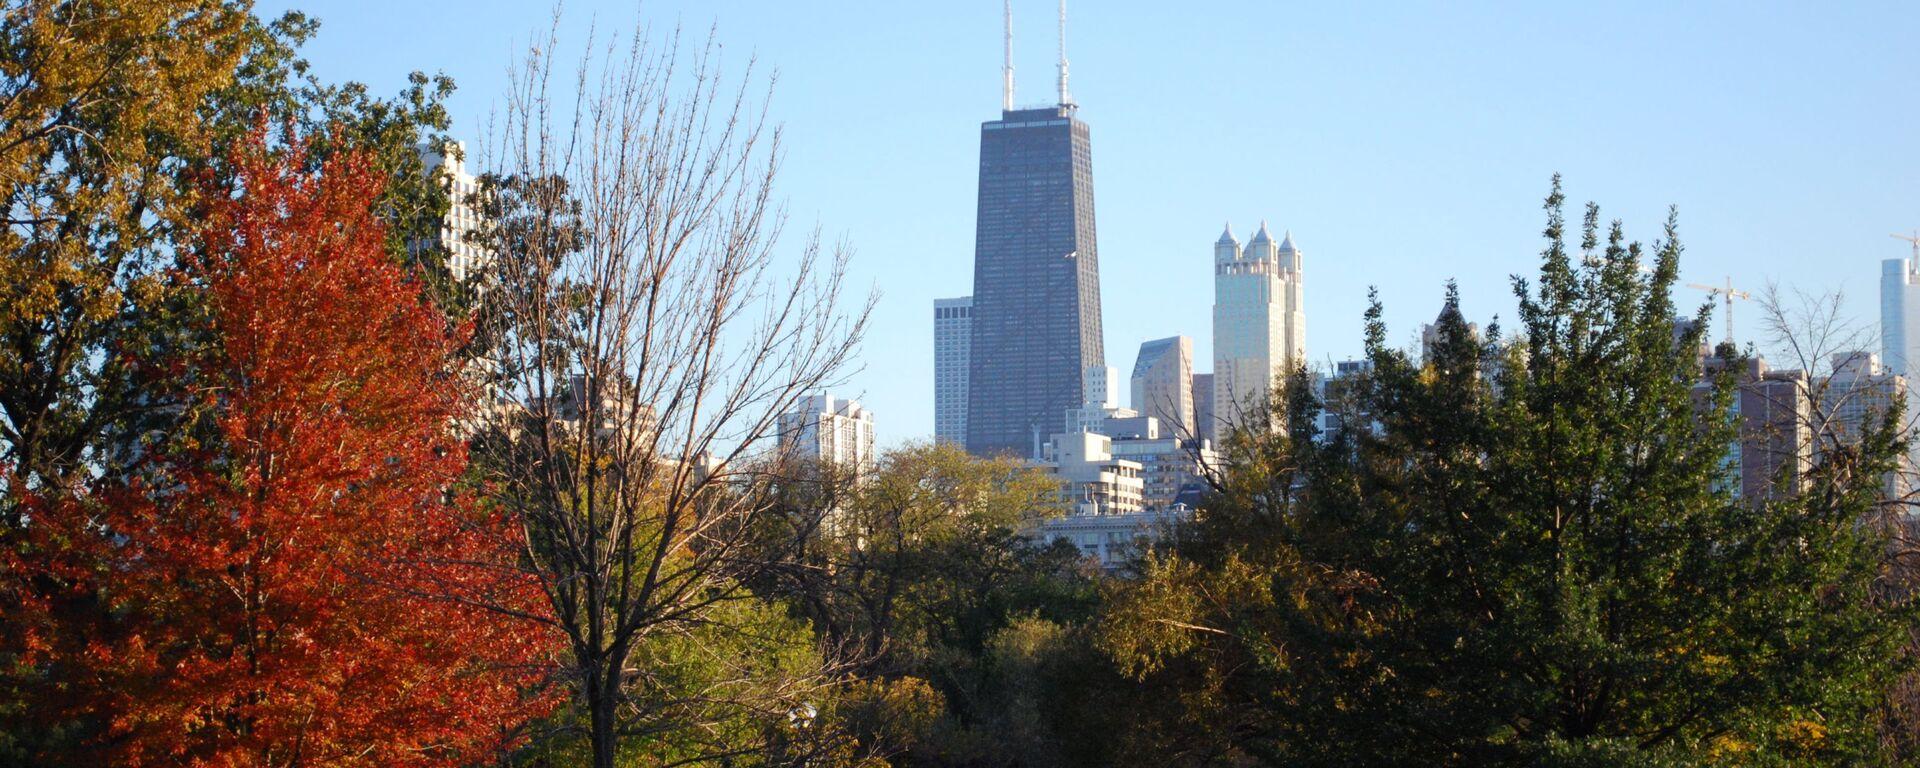 Chicago - Sputnik Polska, 1920, 26.09.2020